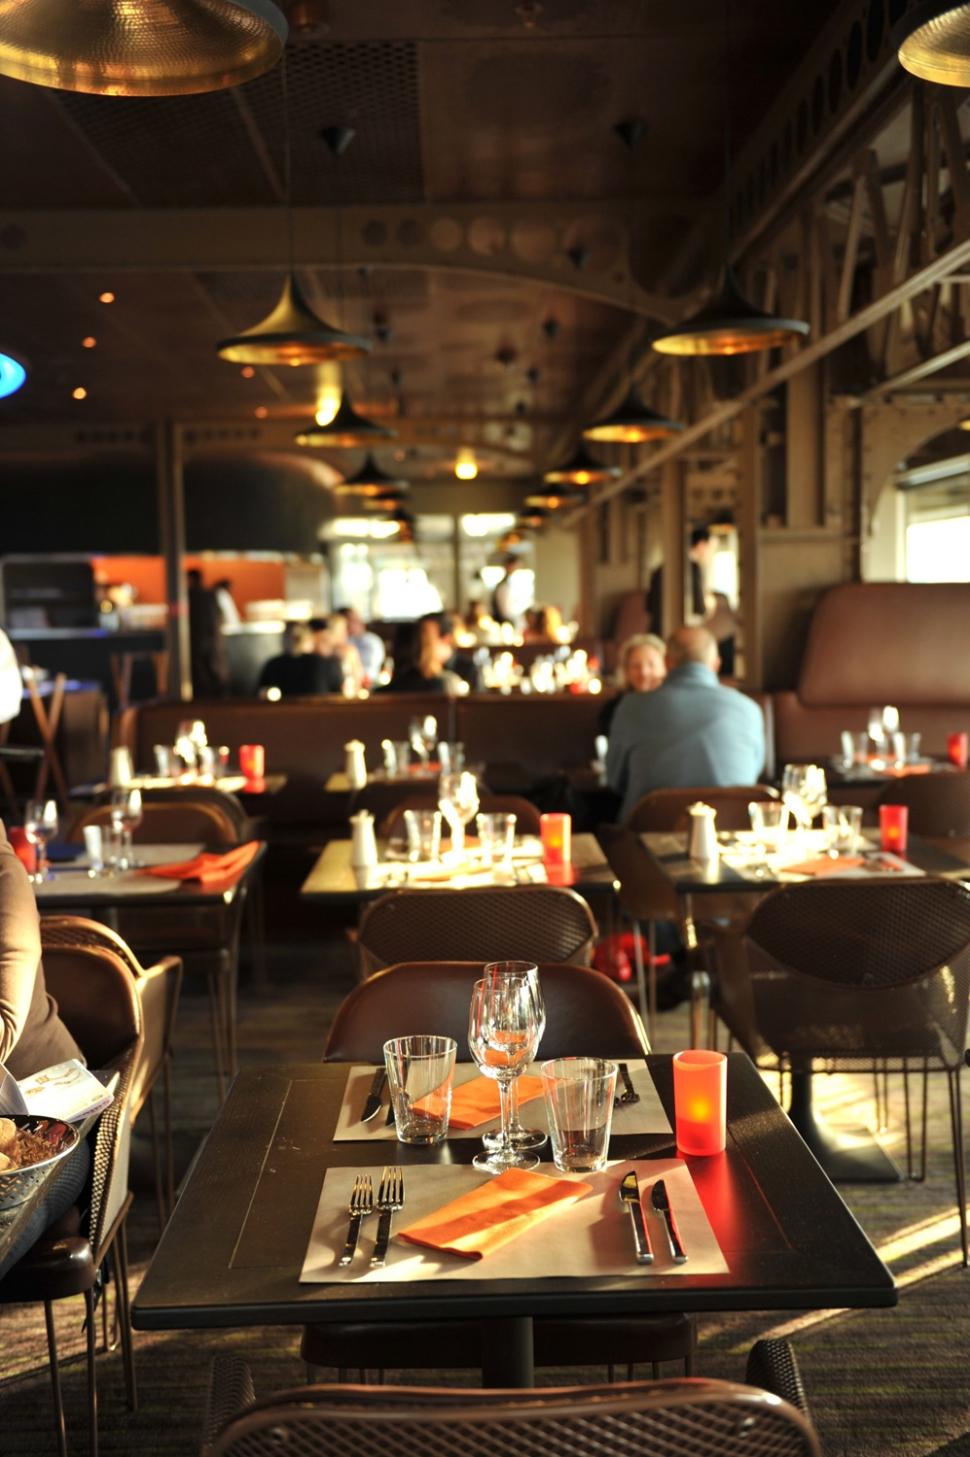 58 tour eiffel stouring in france - 58 tour eiffel restaurant ...